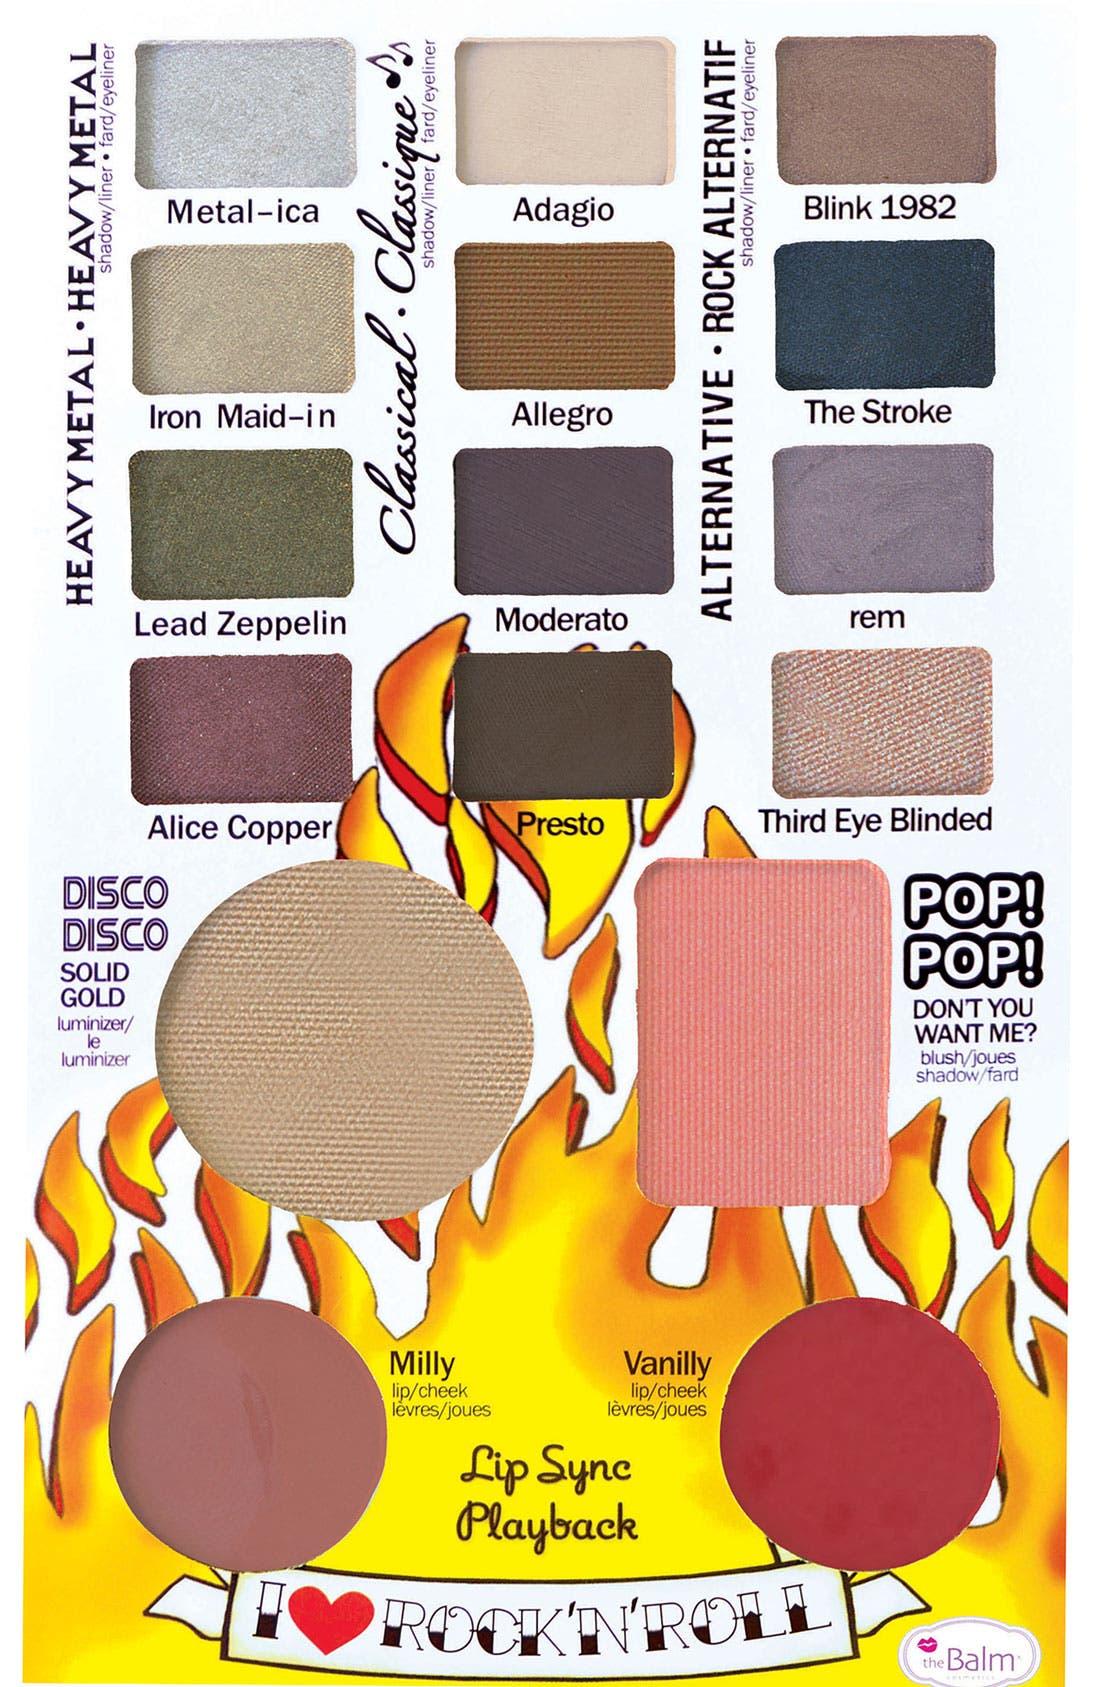 Main Image - theBalm 'Balm Jovi Rockstar' Face Palette